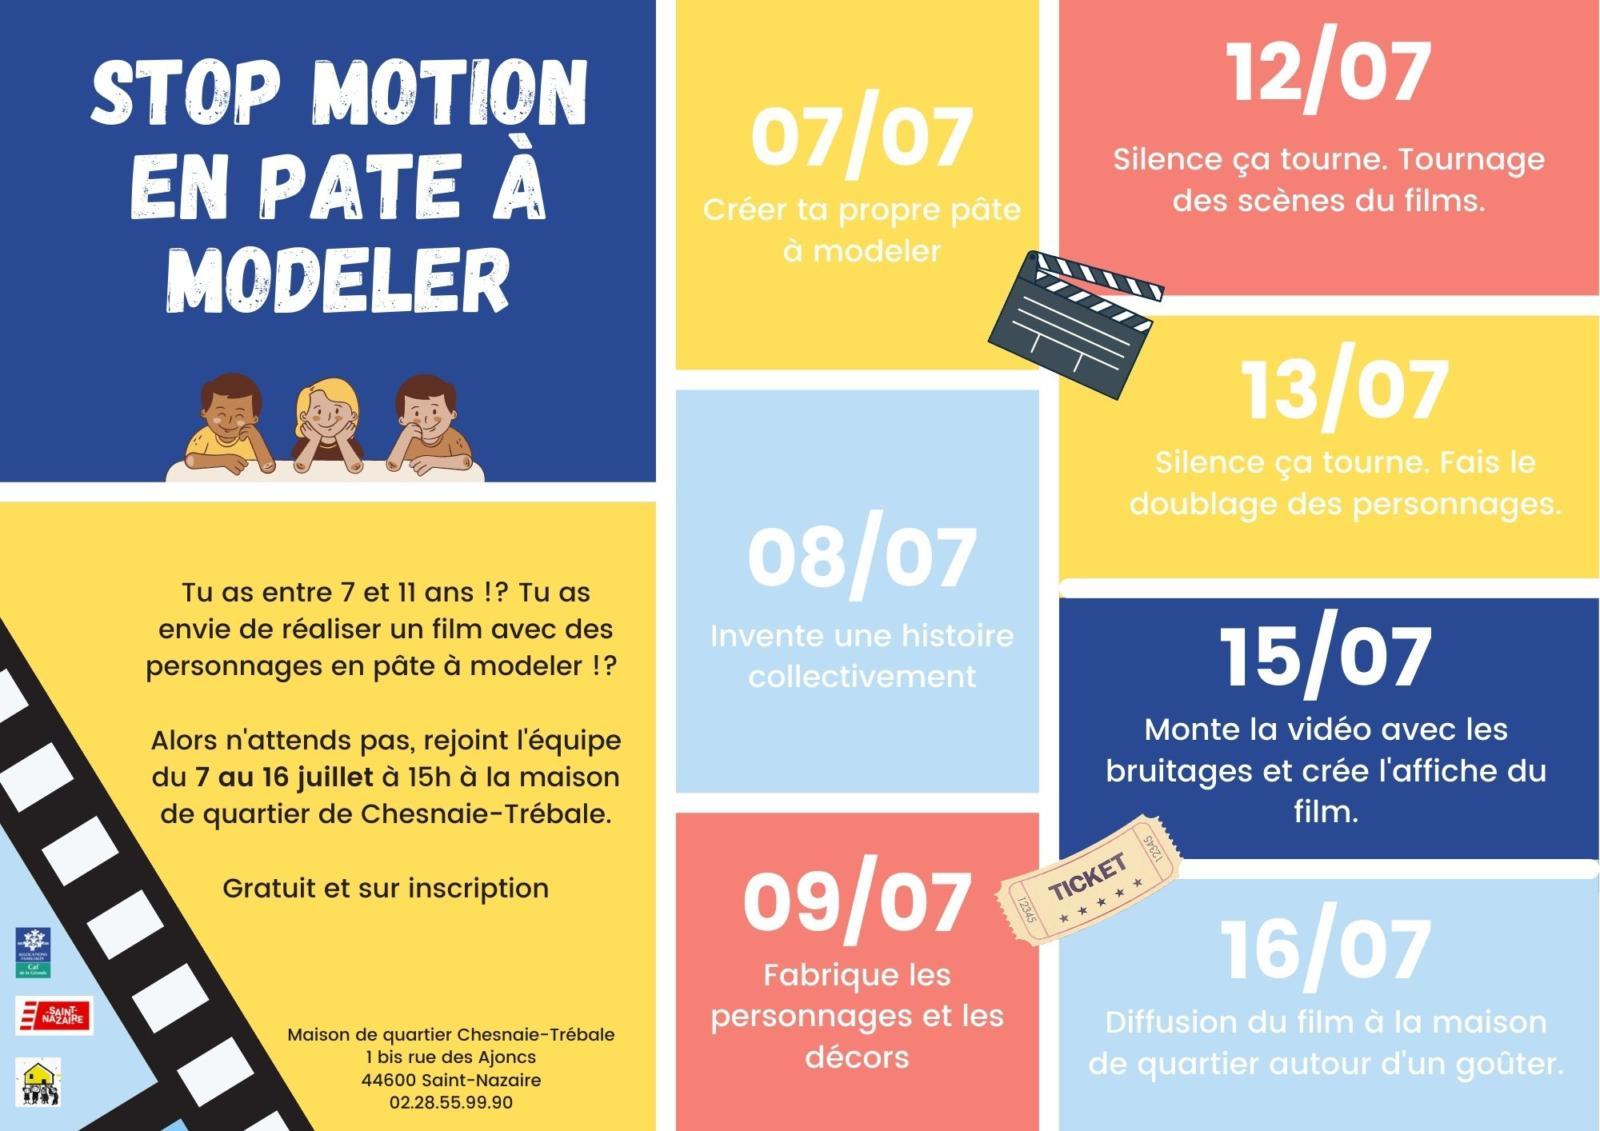 Stop motion en pate à modeler